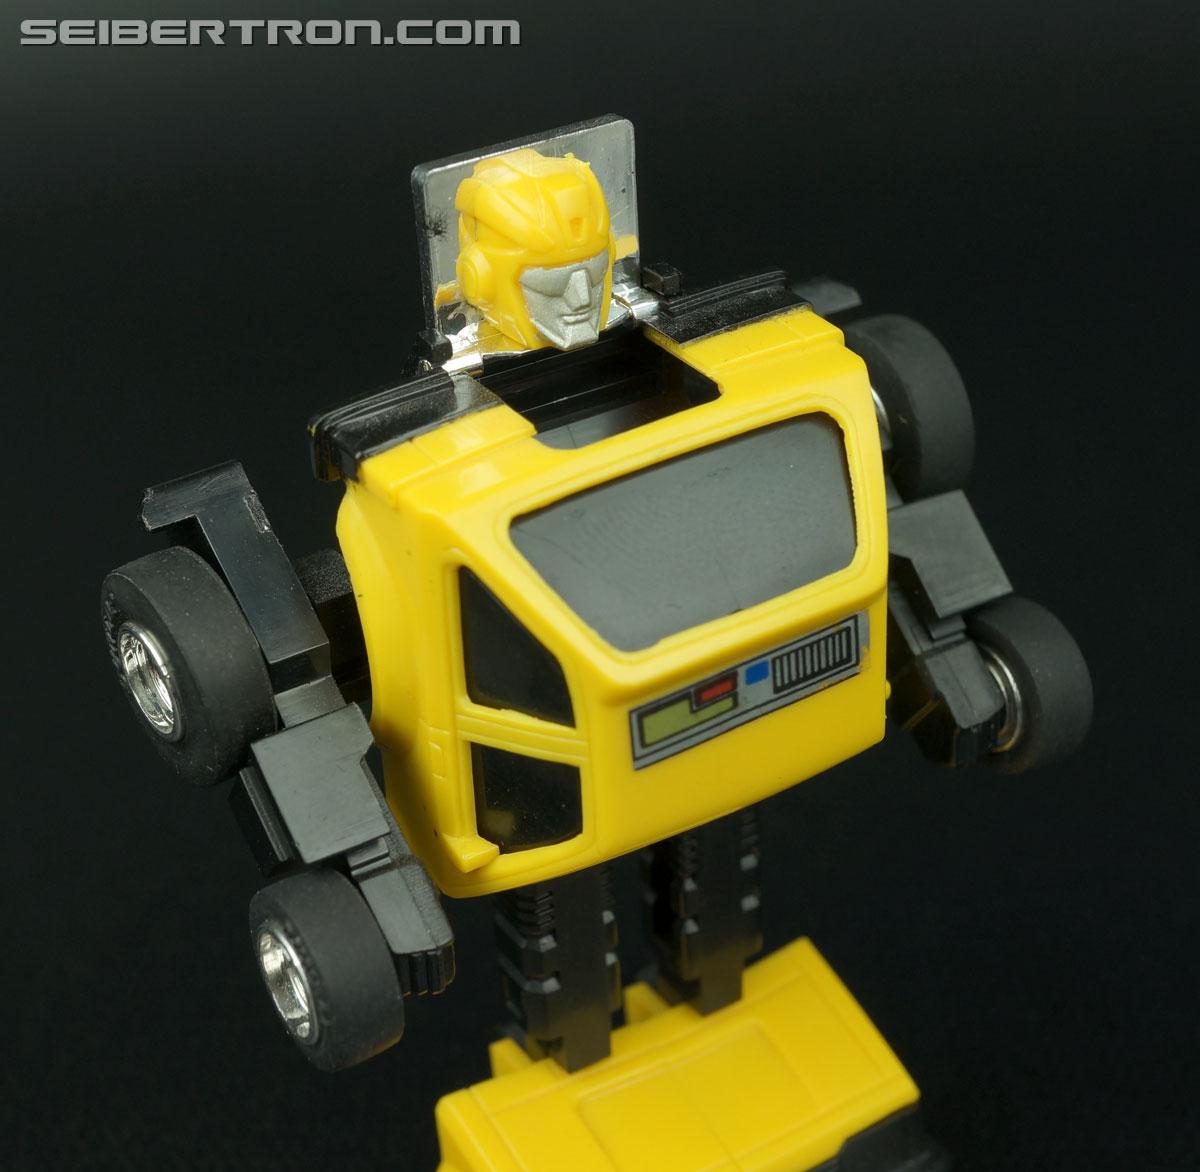 Transformers Micro Change MC04 Mini CAR Robo 02 XG1500 (Yellow) (Image #57 of 70)